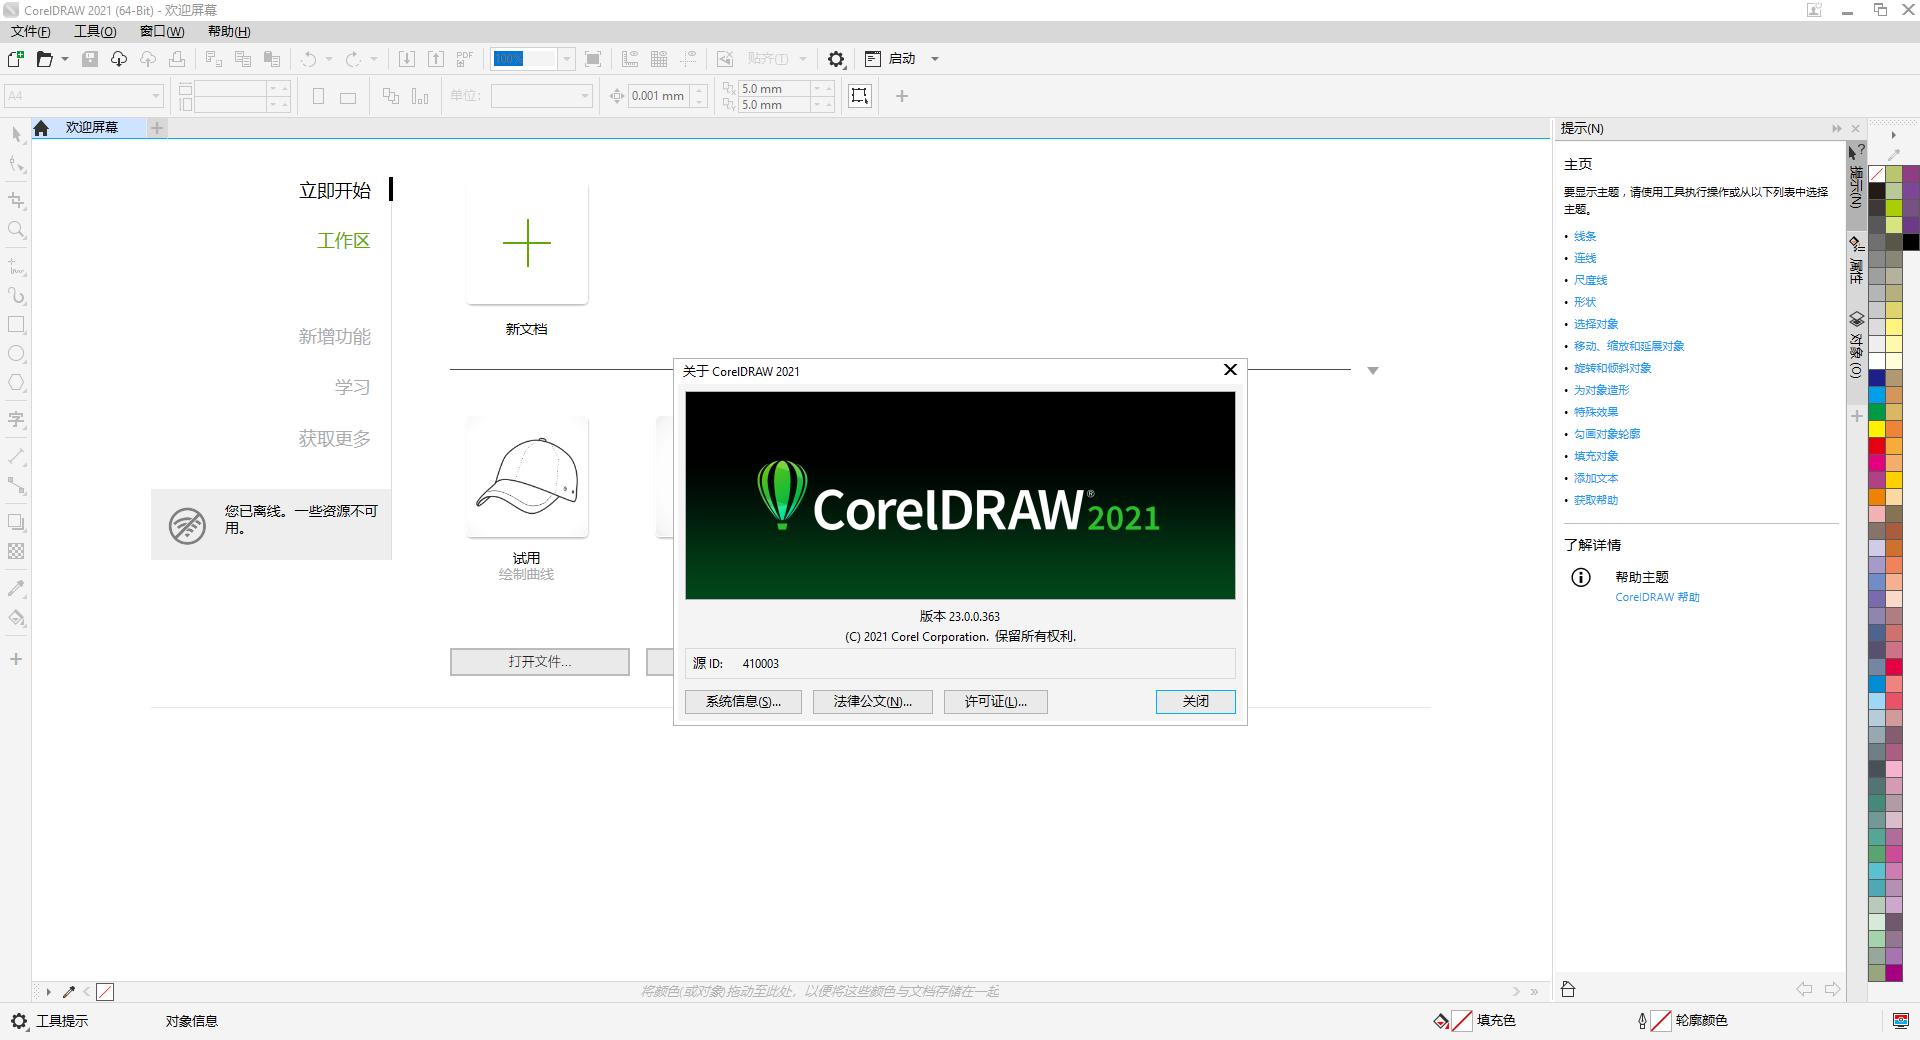 CorelDRAW 2021安装包及安装教程